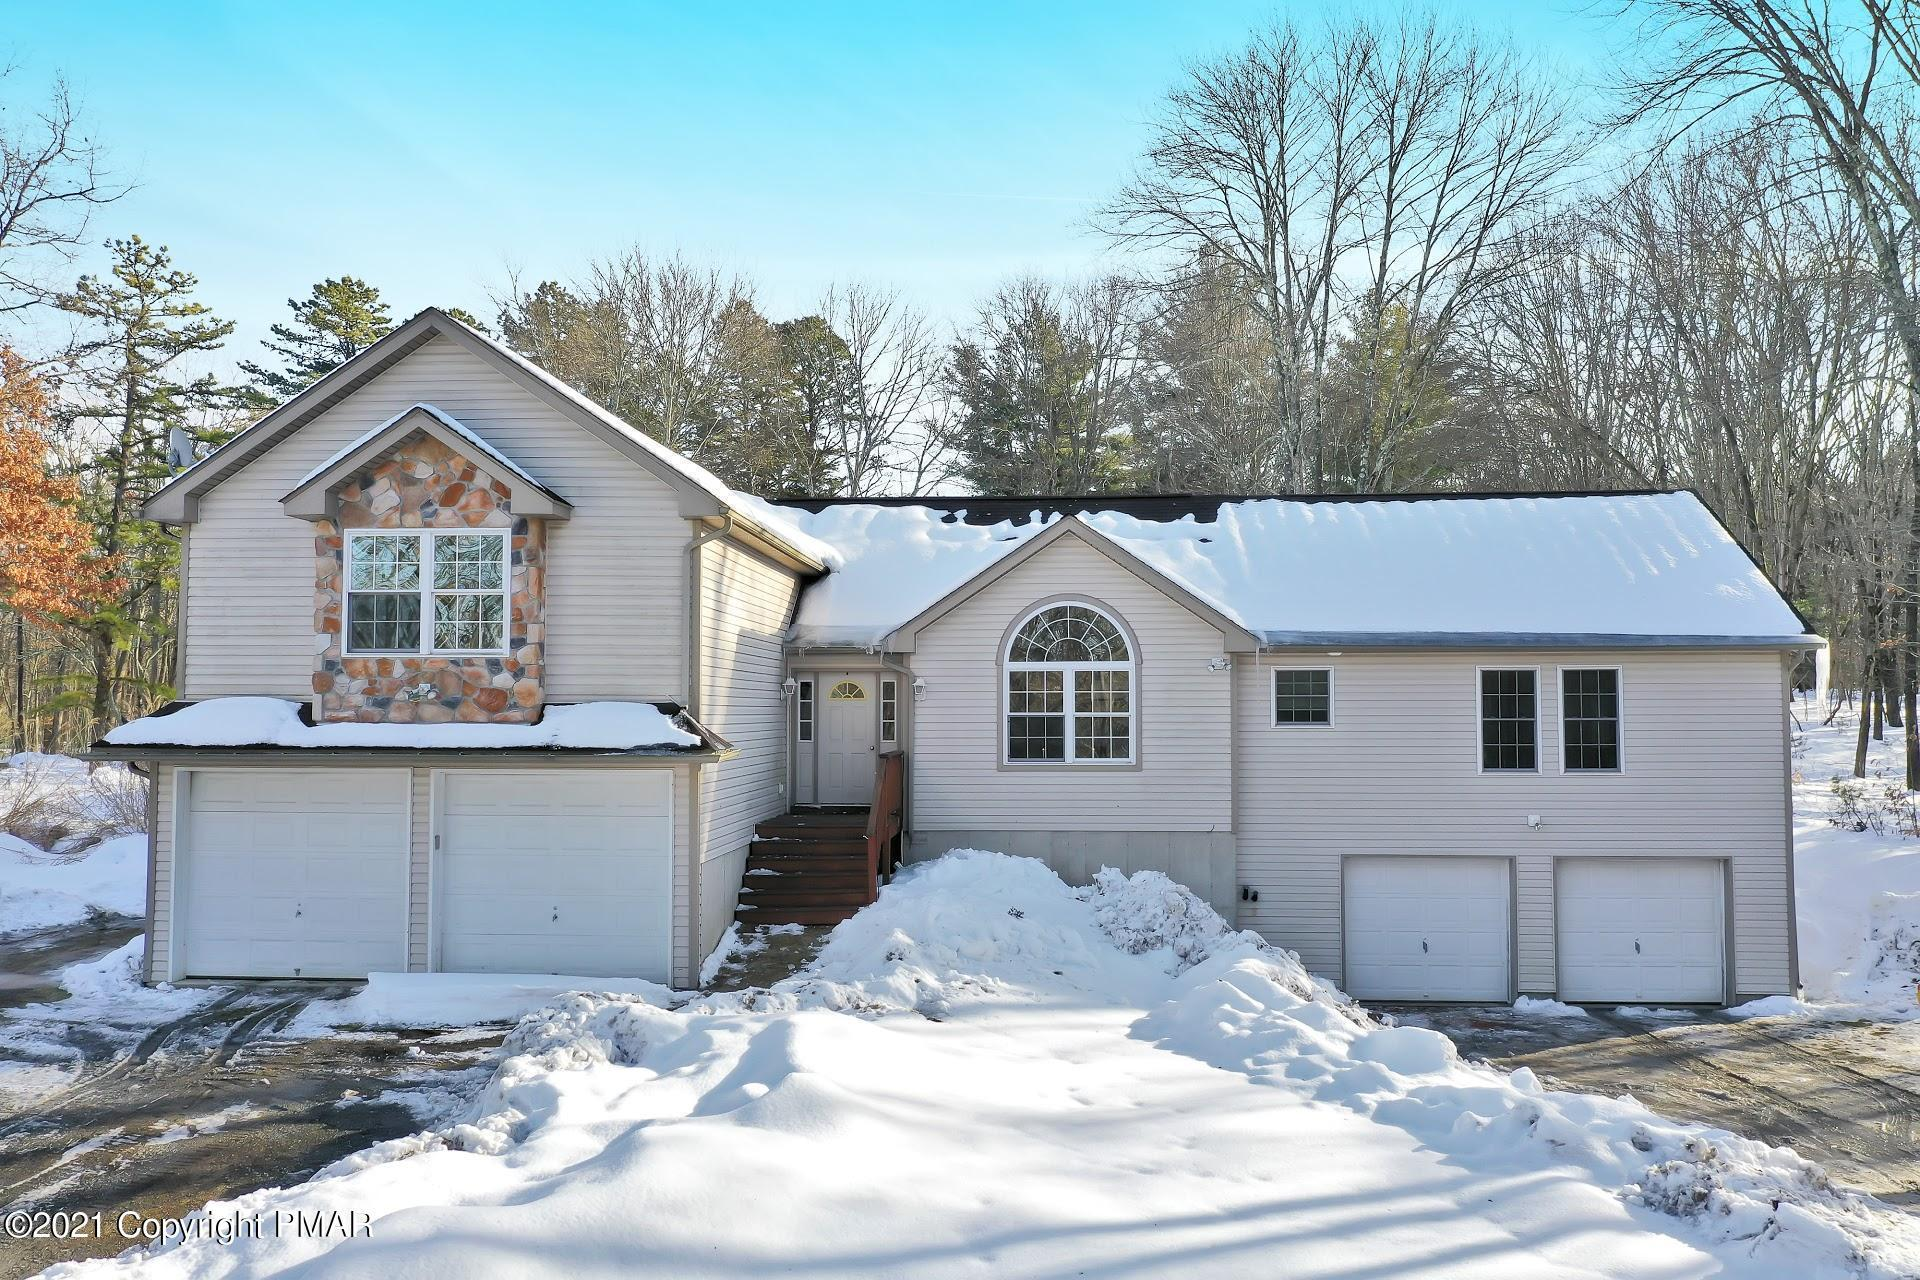 232 Cherry Lane Rd, Bartonsville, PA 18321